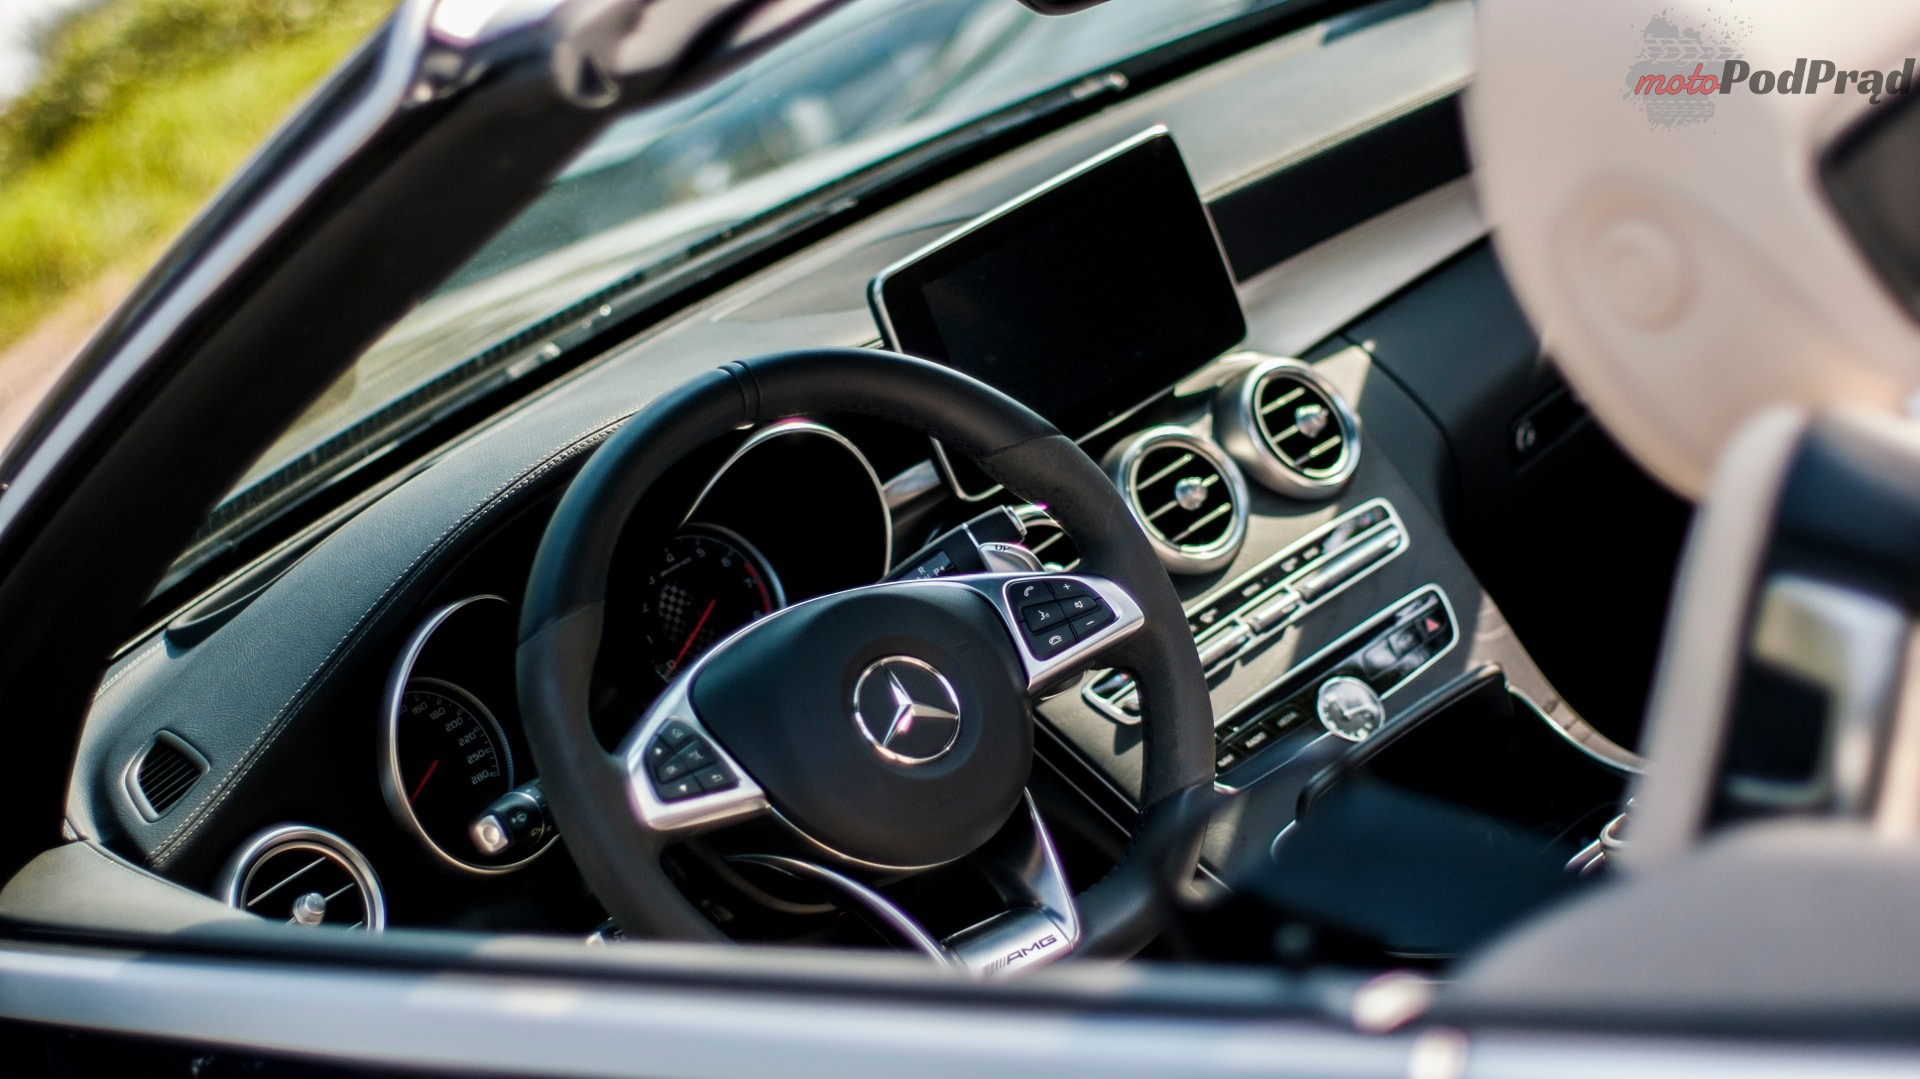 mercedes amg c43 cabrio 12 Minitest: Mercedes AMG C 43 Cabrio   Ostatnie promienie słońca